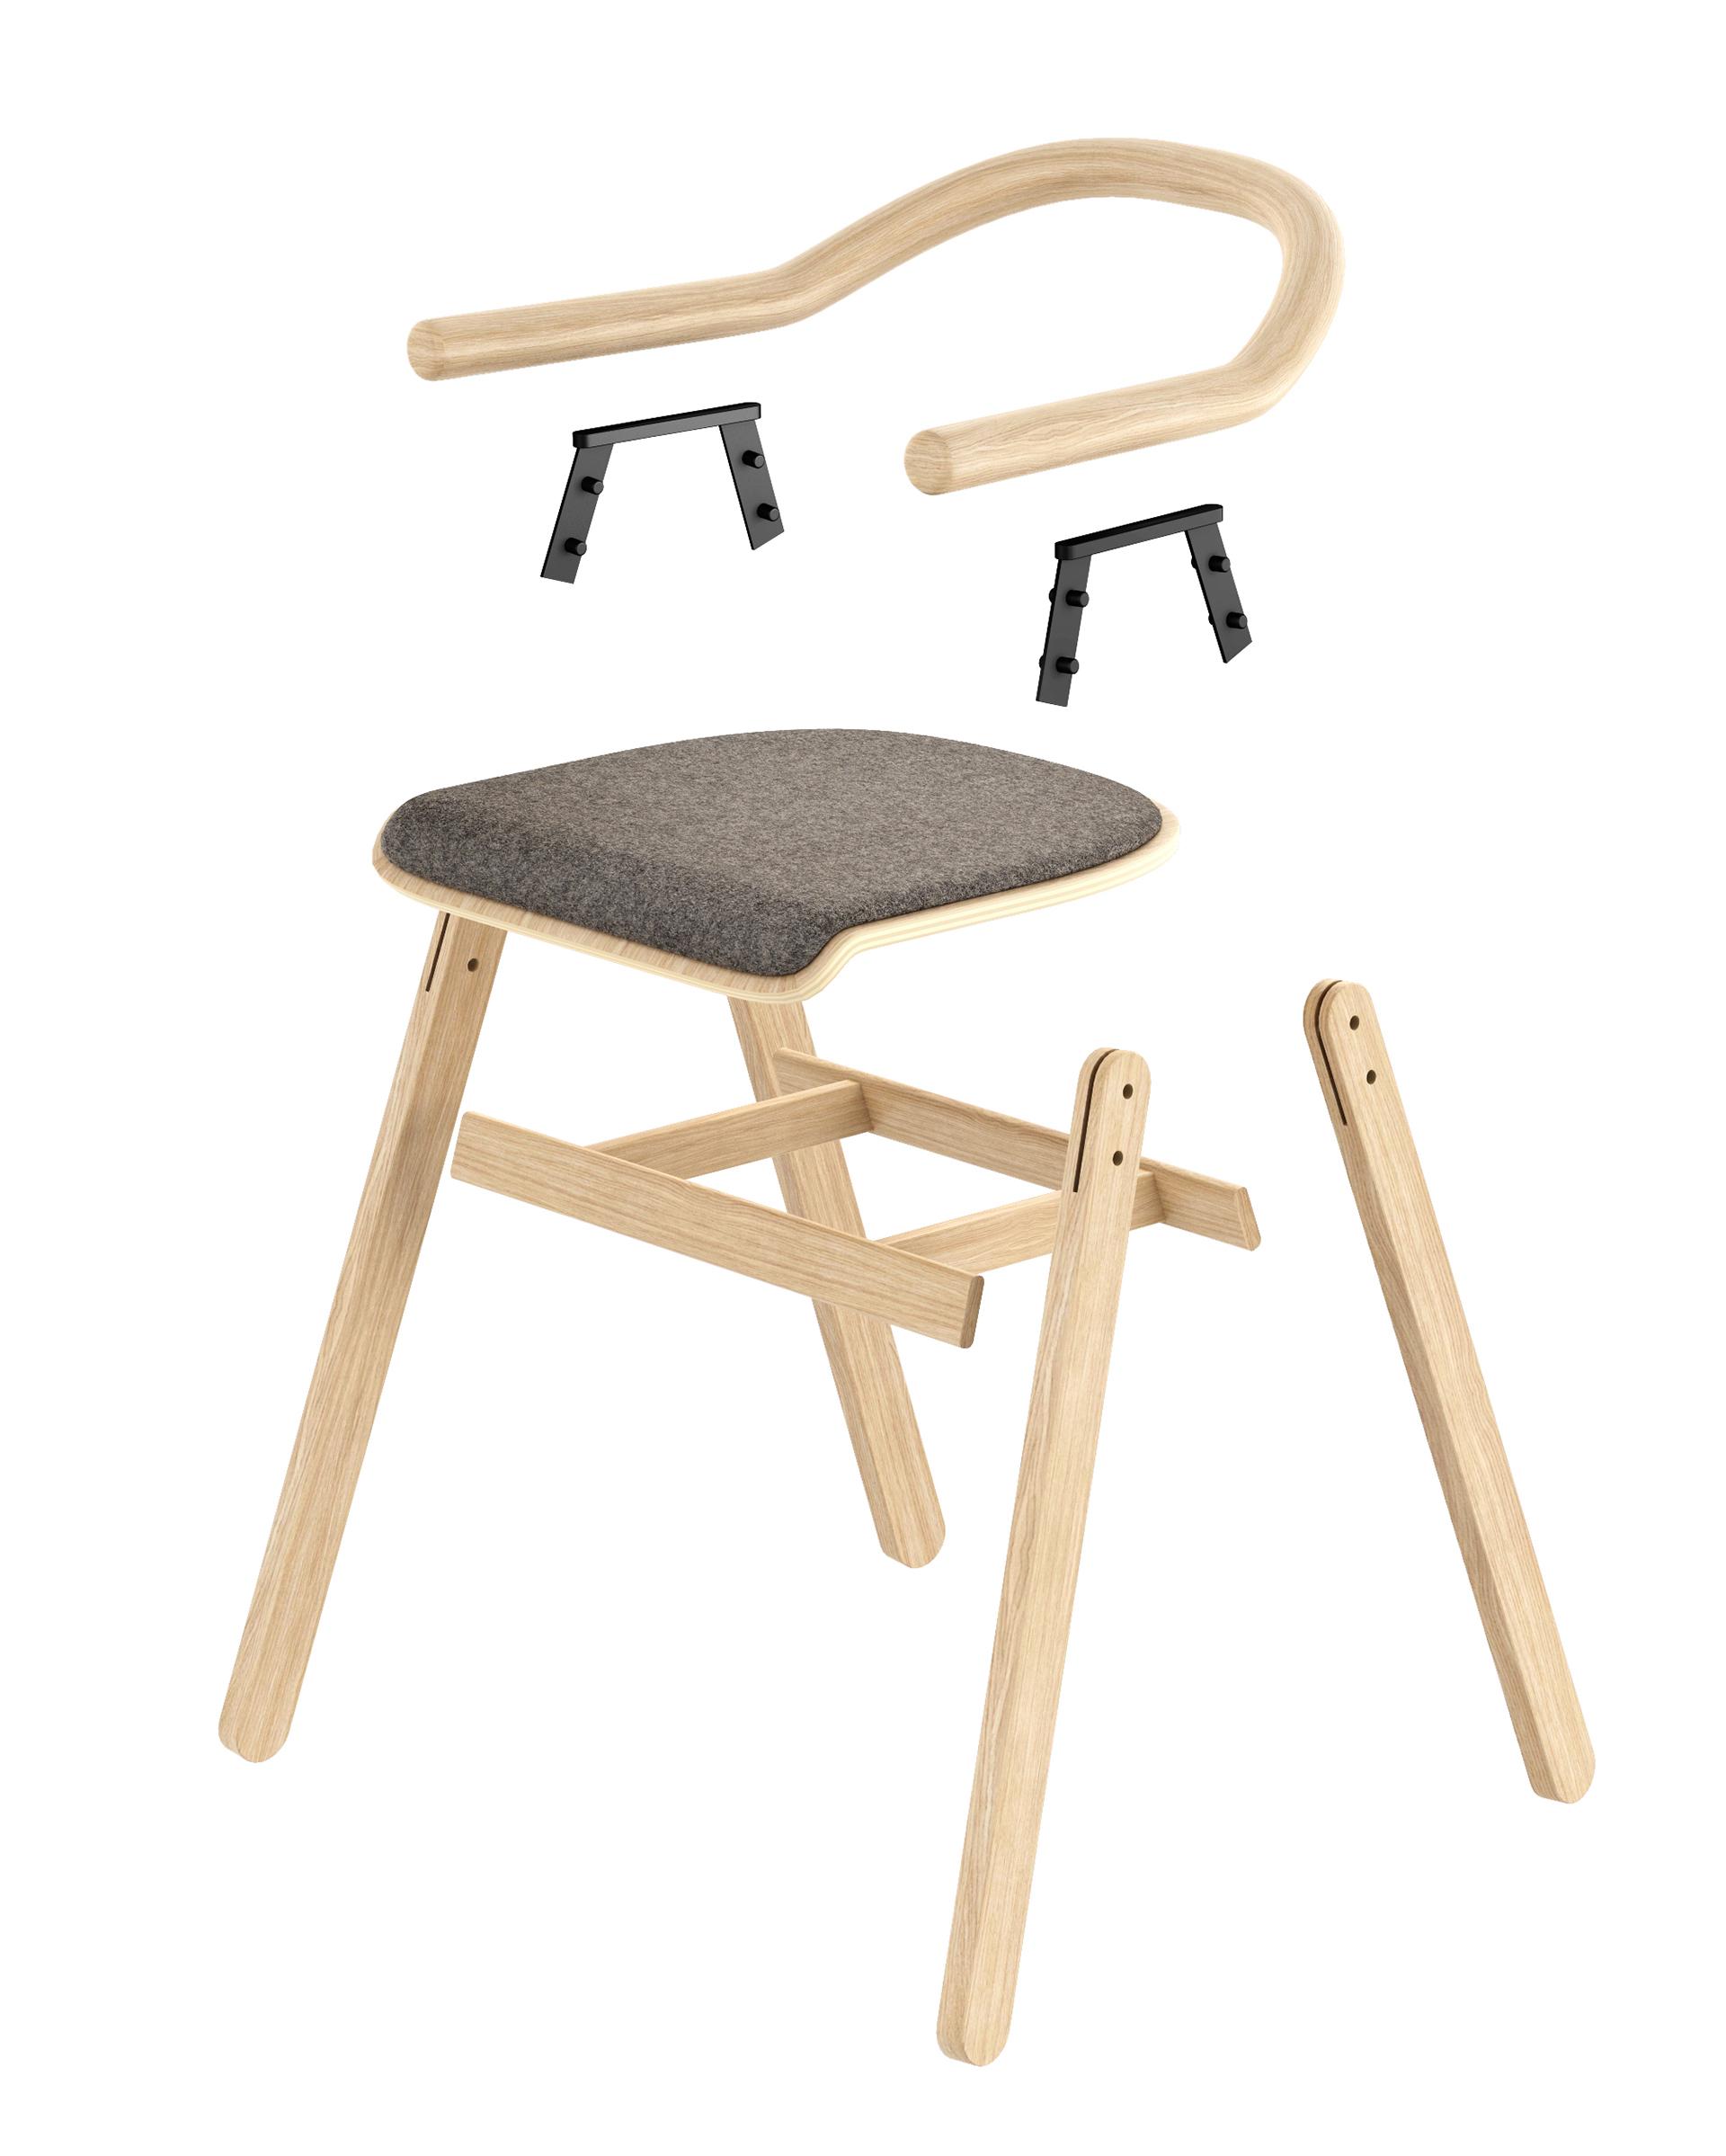 TOON Chair by Radek Nowakowski for Redo Design Studio